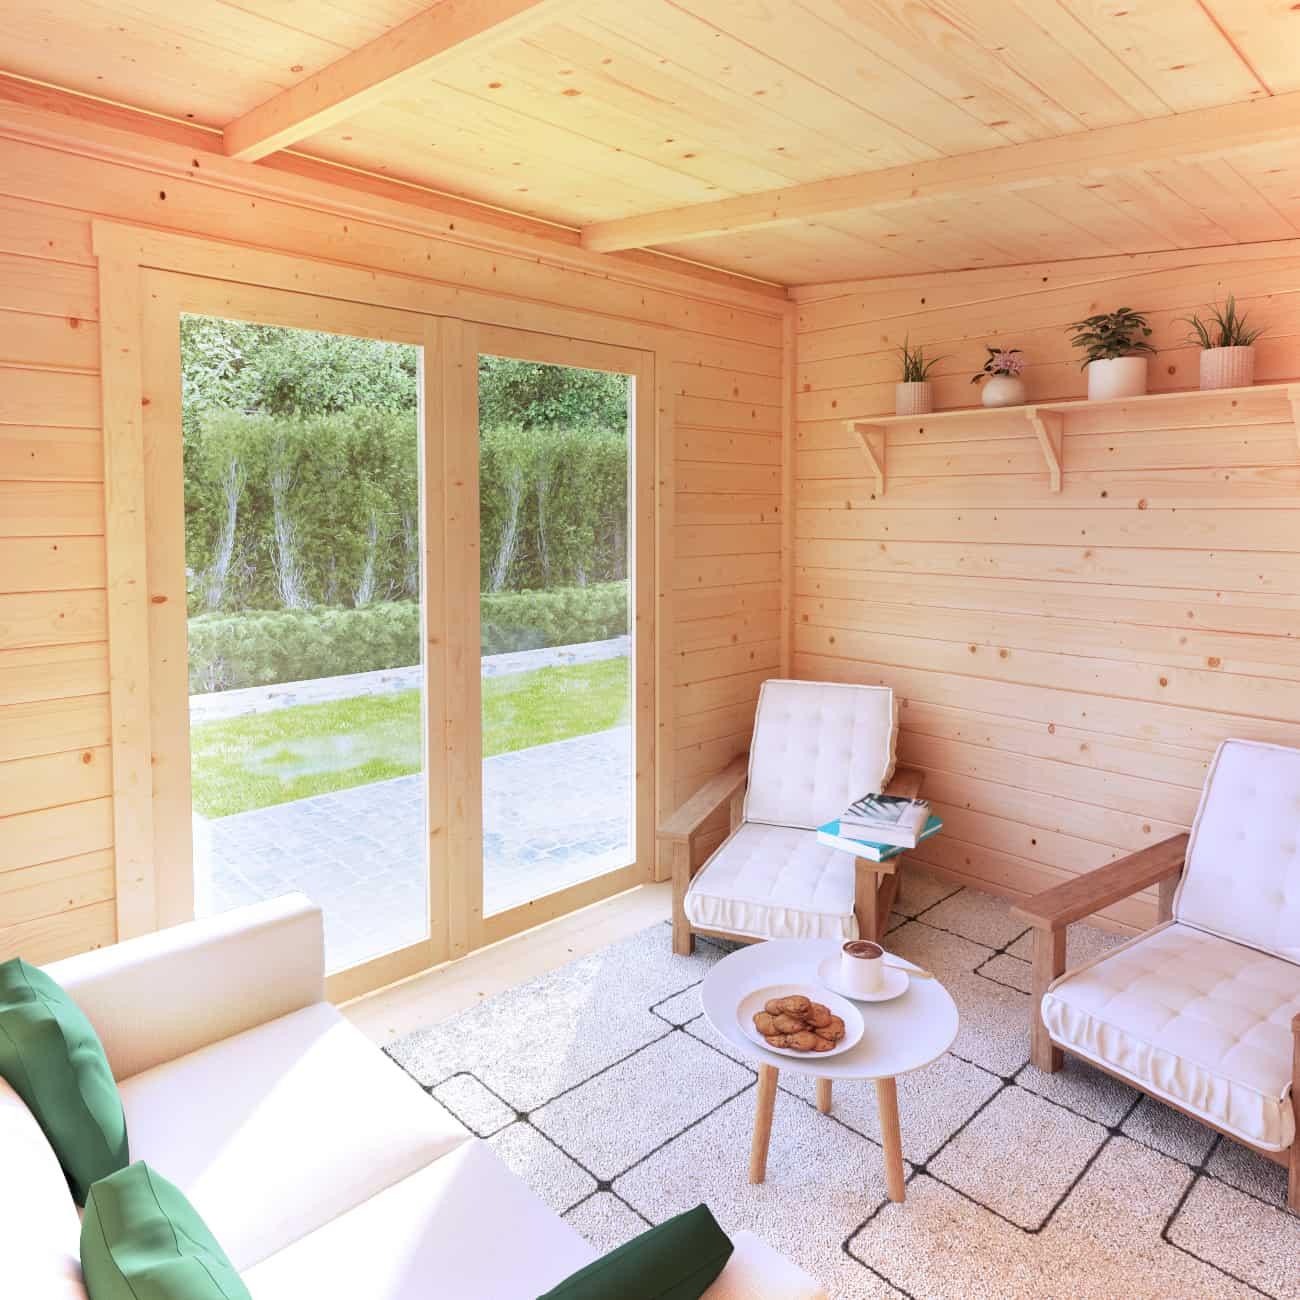 BillyOh Tianna Pent roof wooden summerhouse interior